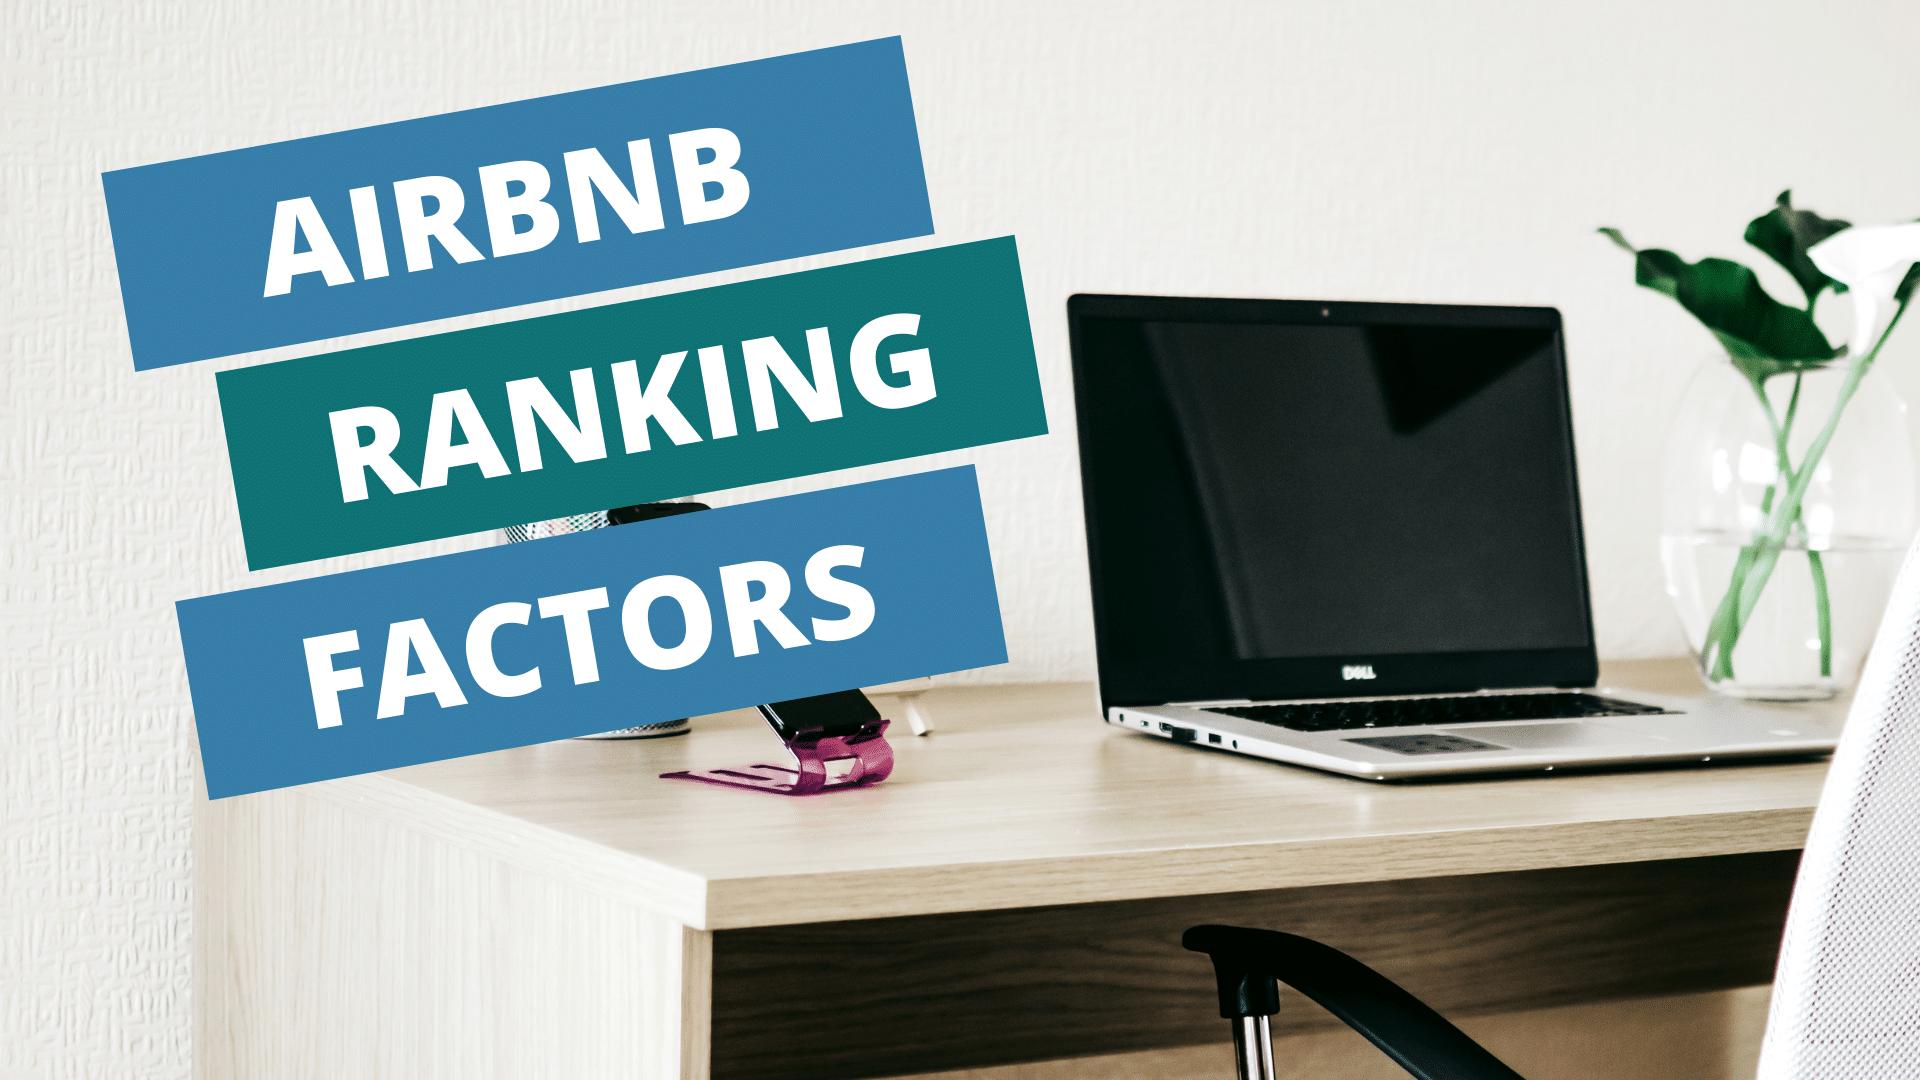 airbnb ranking factors laptop